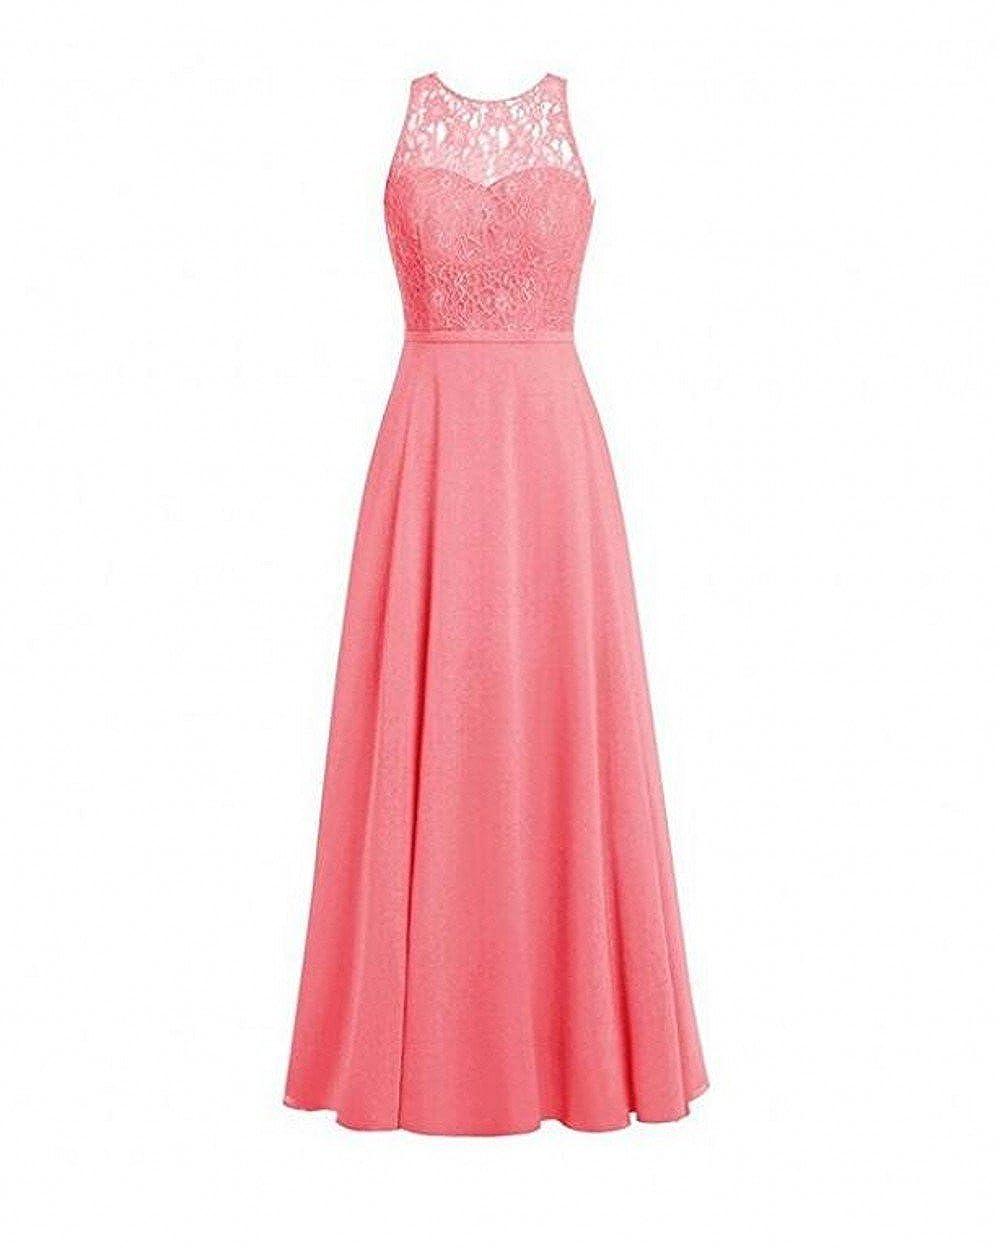 13b8b7e7d506f Botong O-Neck Long Chiffon Bridesmaid Dresses Sleeveless Lace Prom Party  Gown at Amazon Women's Clothing store: